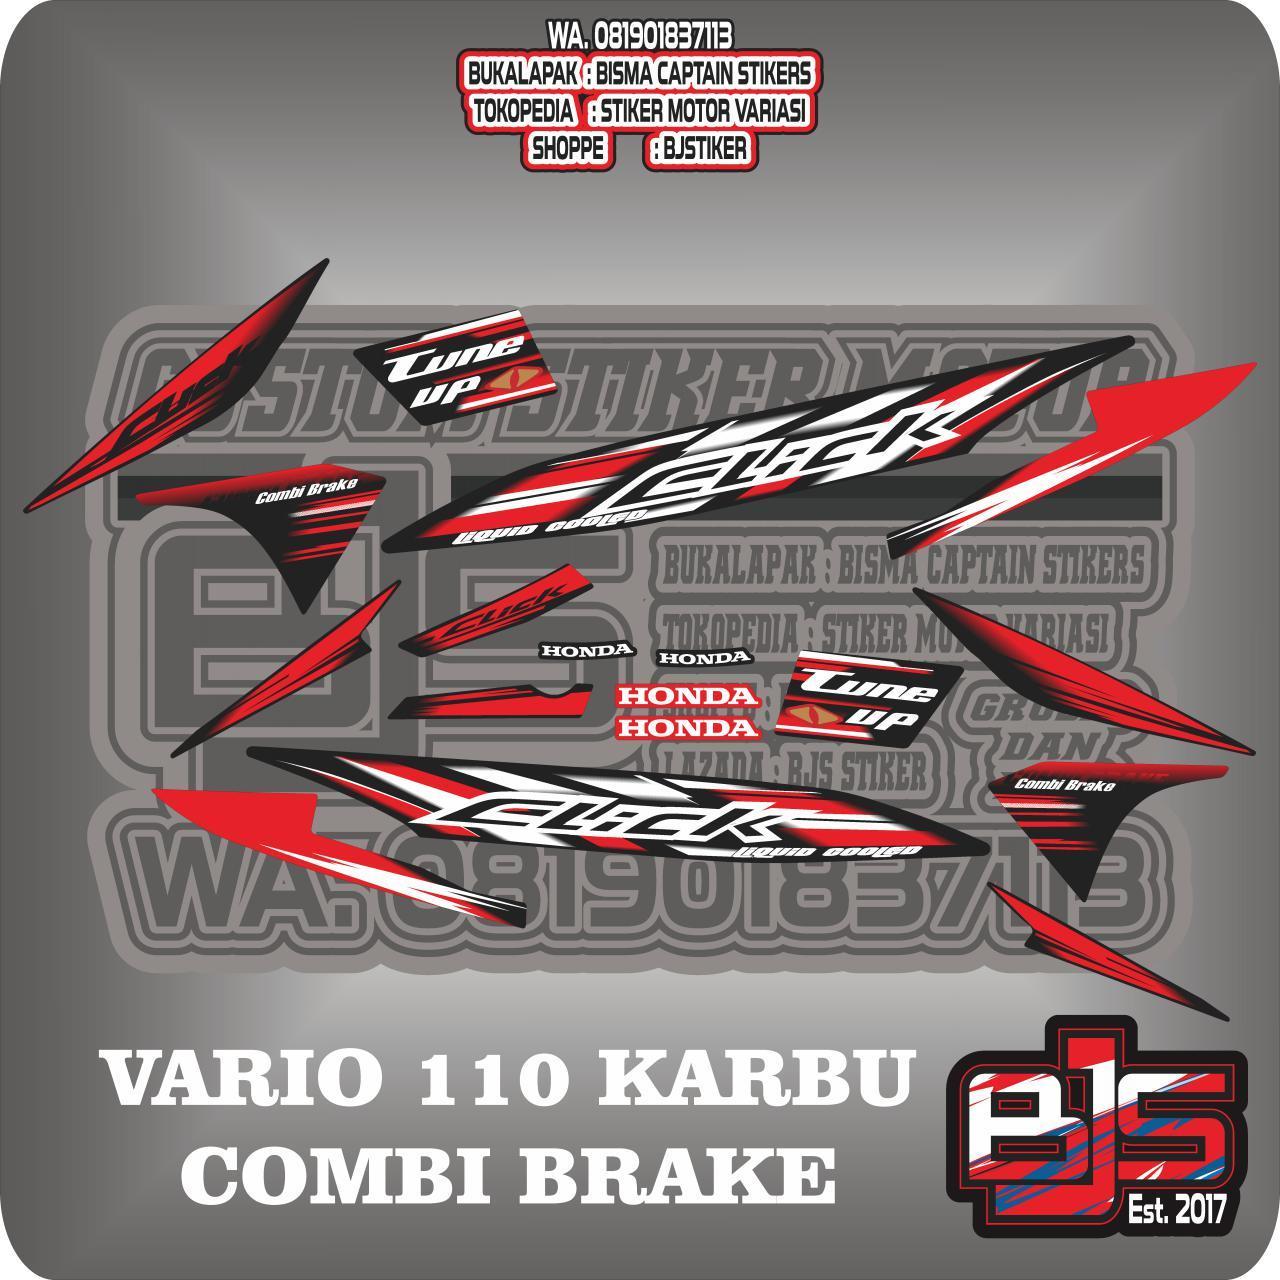 Stiker striping list motor vario 110 karbu click combi brake 5